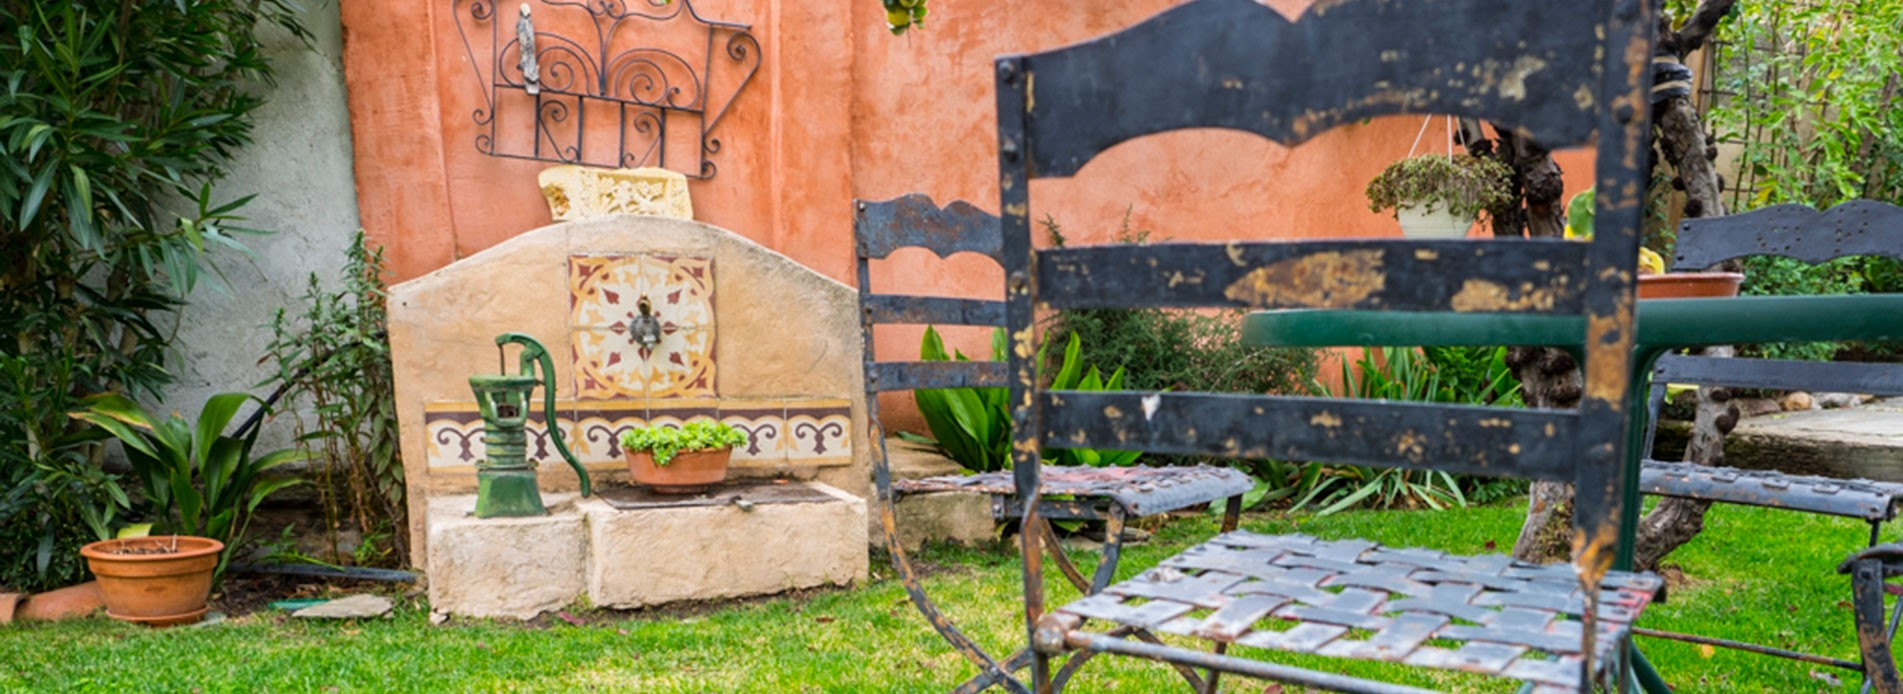 slider1-estancias-rurales-charming-hotels-segovia